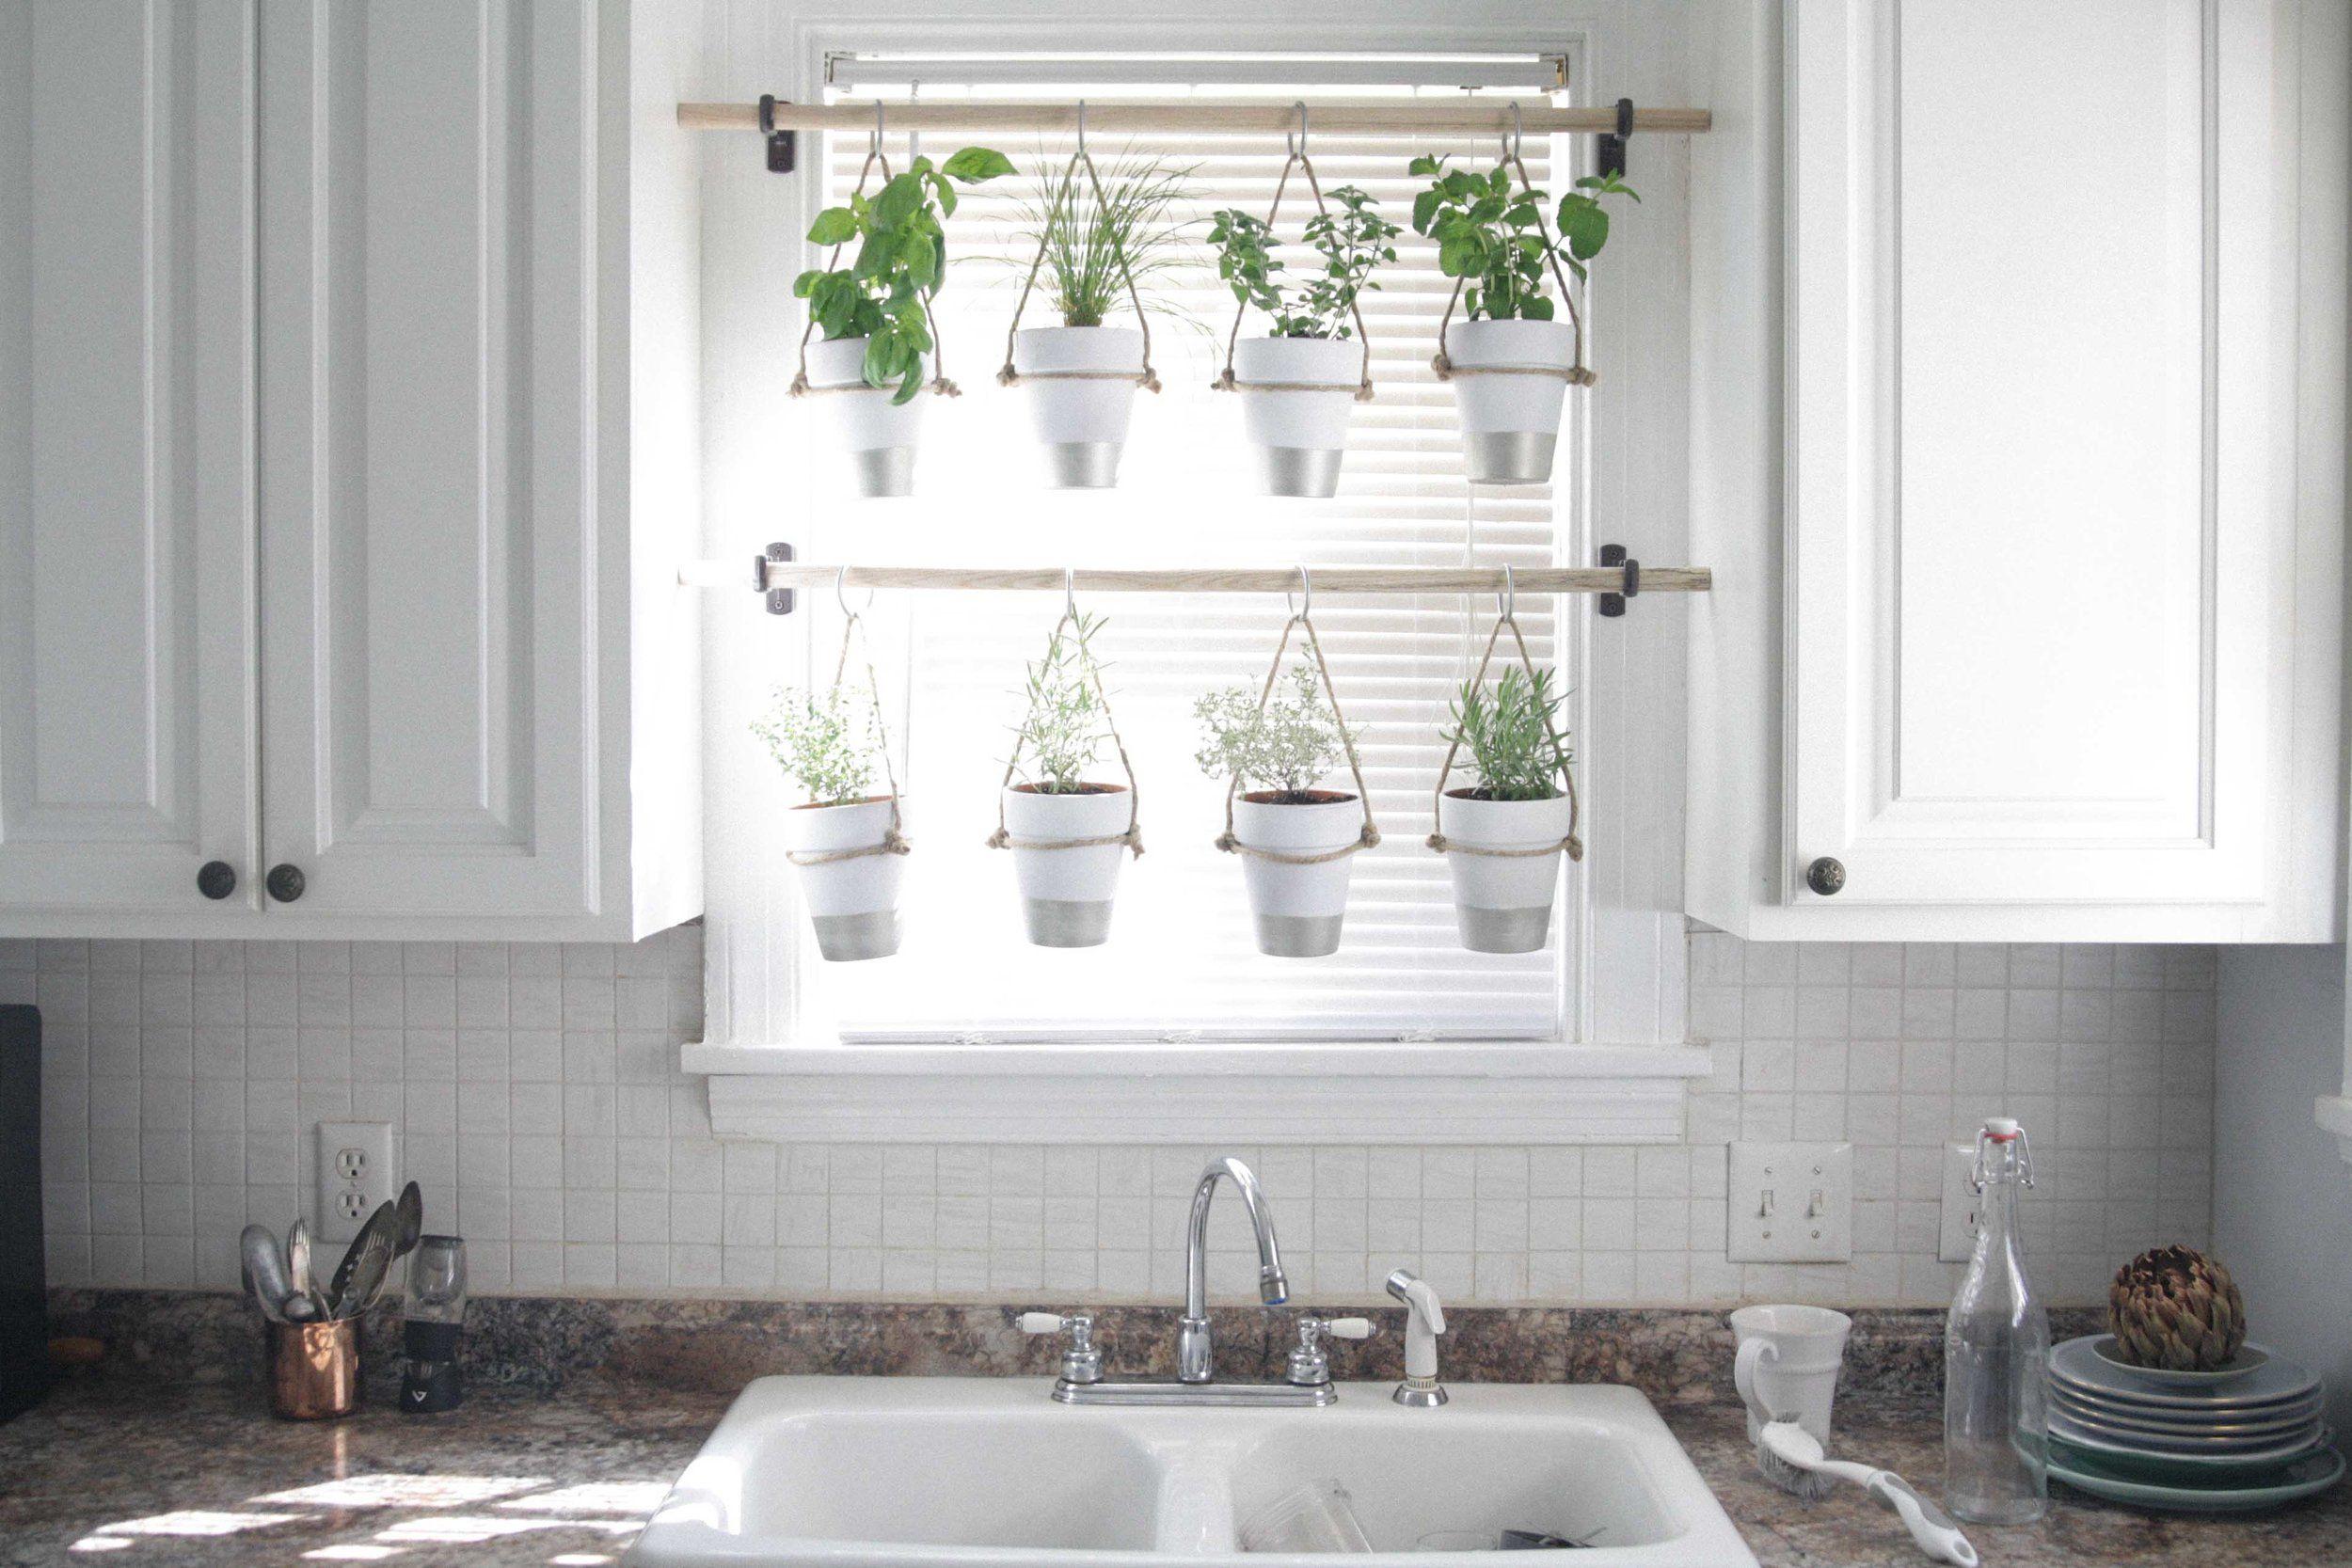 Diy Indoor Hanging Herb Garden Learn How To Make An 400 x 300